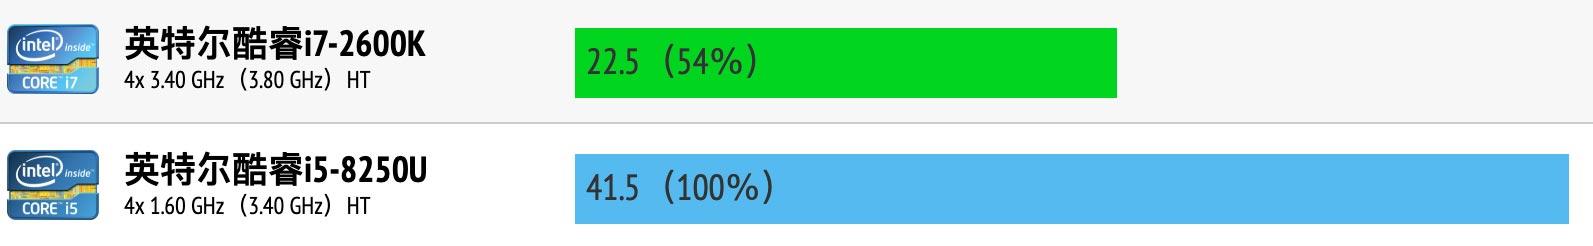 Intel Core i7-2600K和i5-8250U性能跑分对比评测